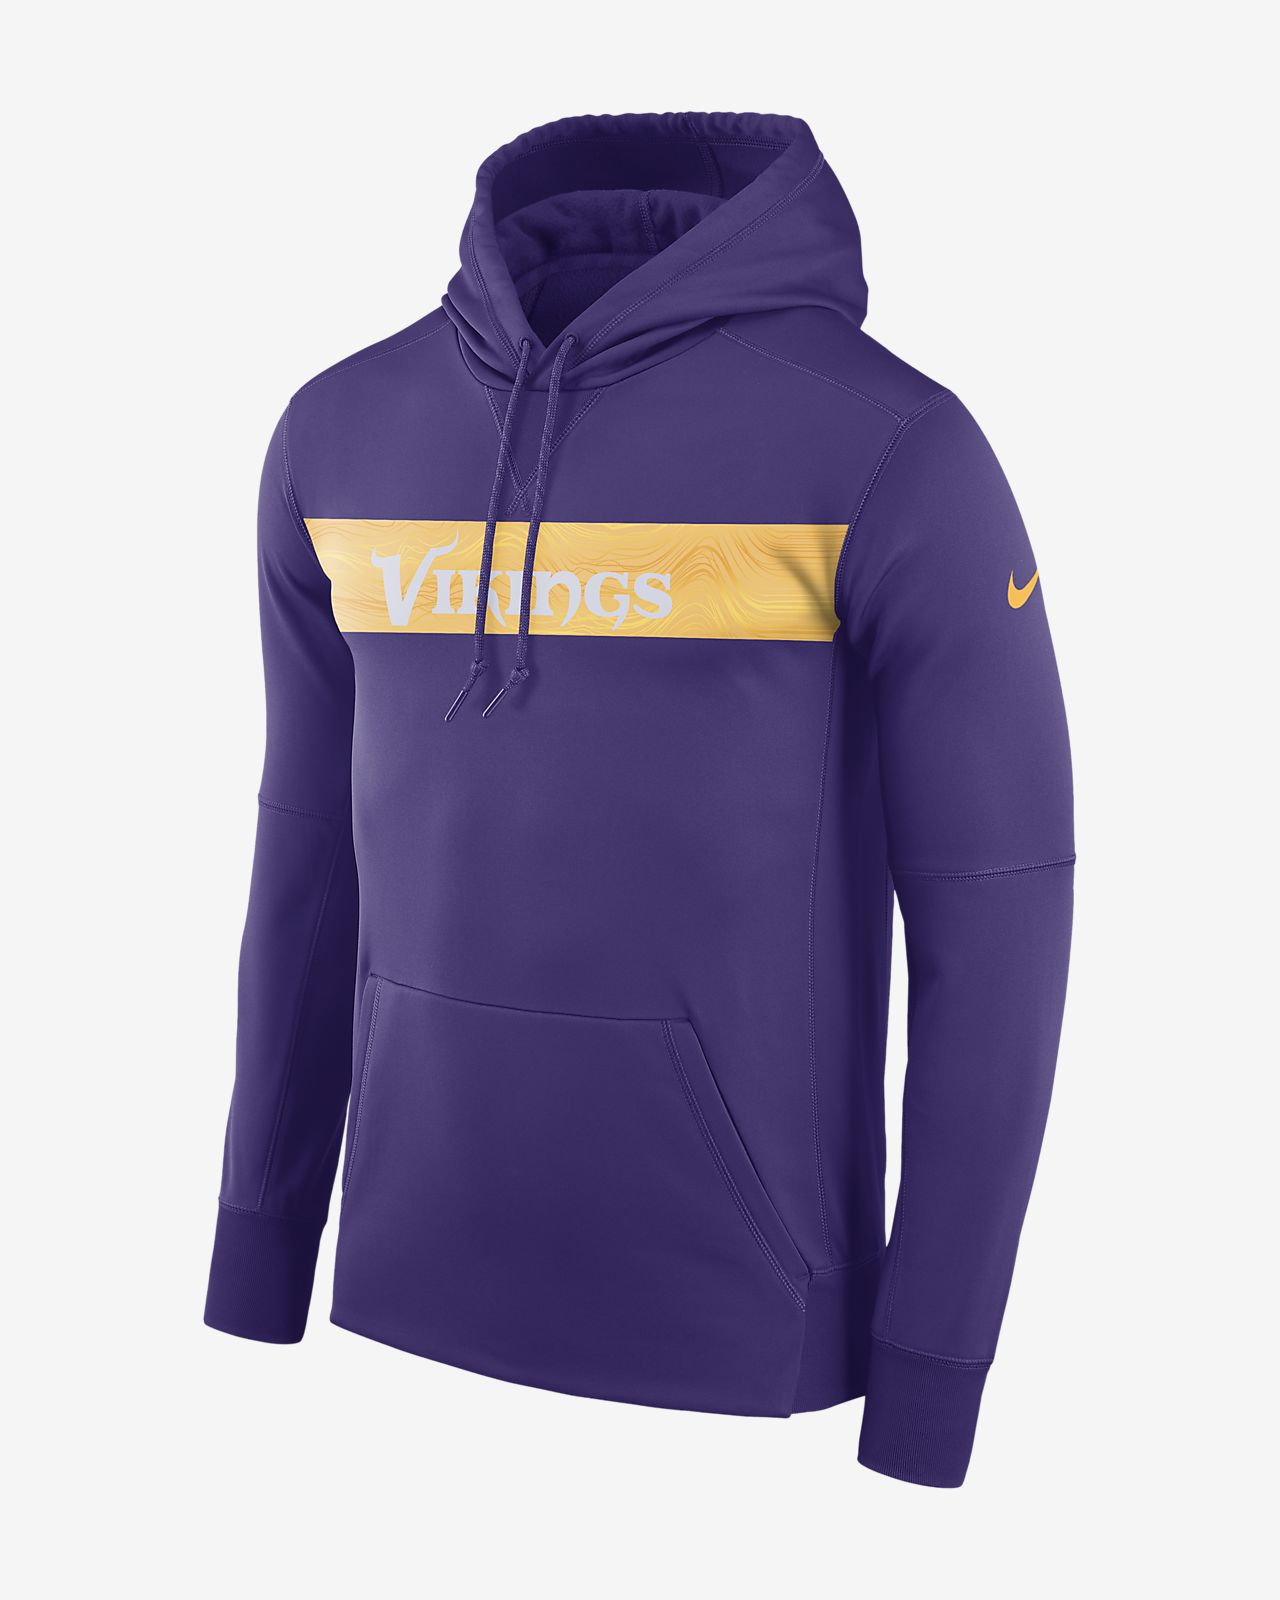 Nike Dri-FIT Therma (NFL Vikings) Dessuadora amb caputxa - Home